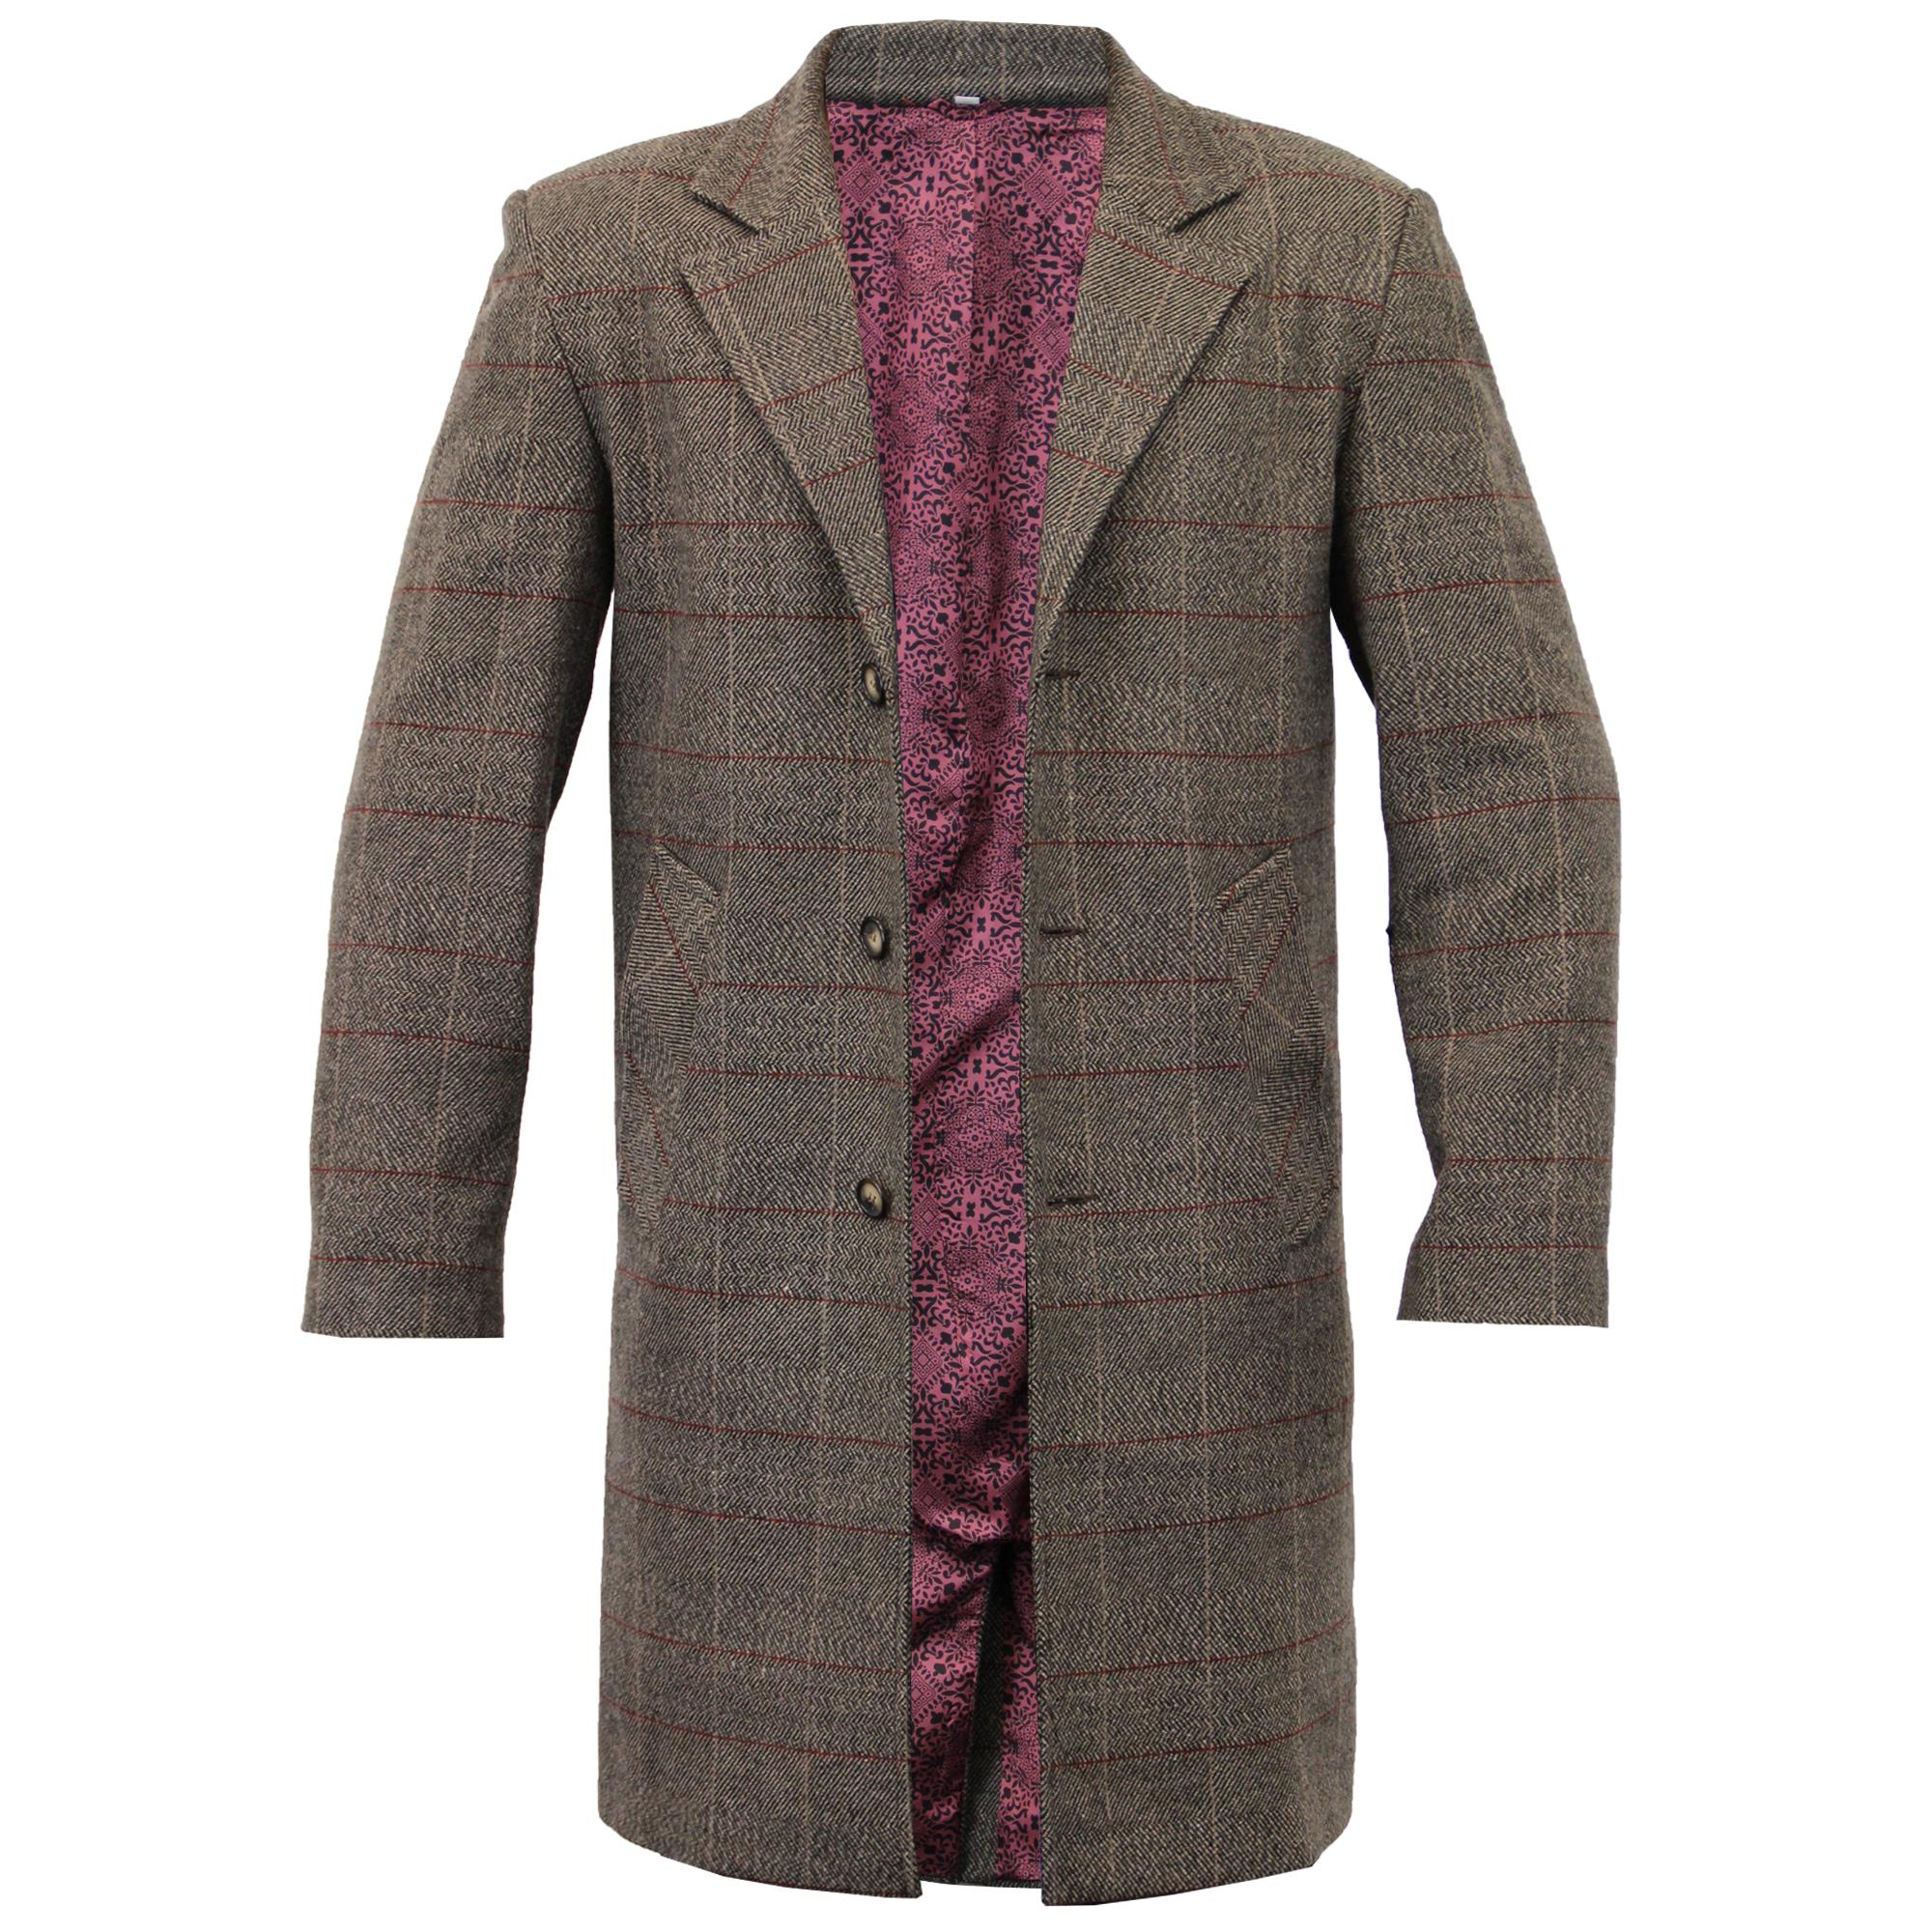 Mens Wool Mix Trench Coat Checked Long Jacket Herringbone Tweed ...